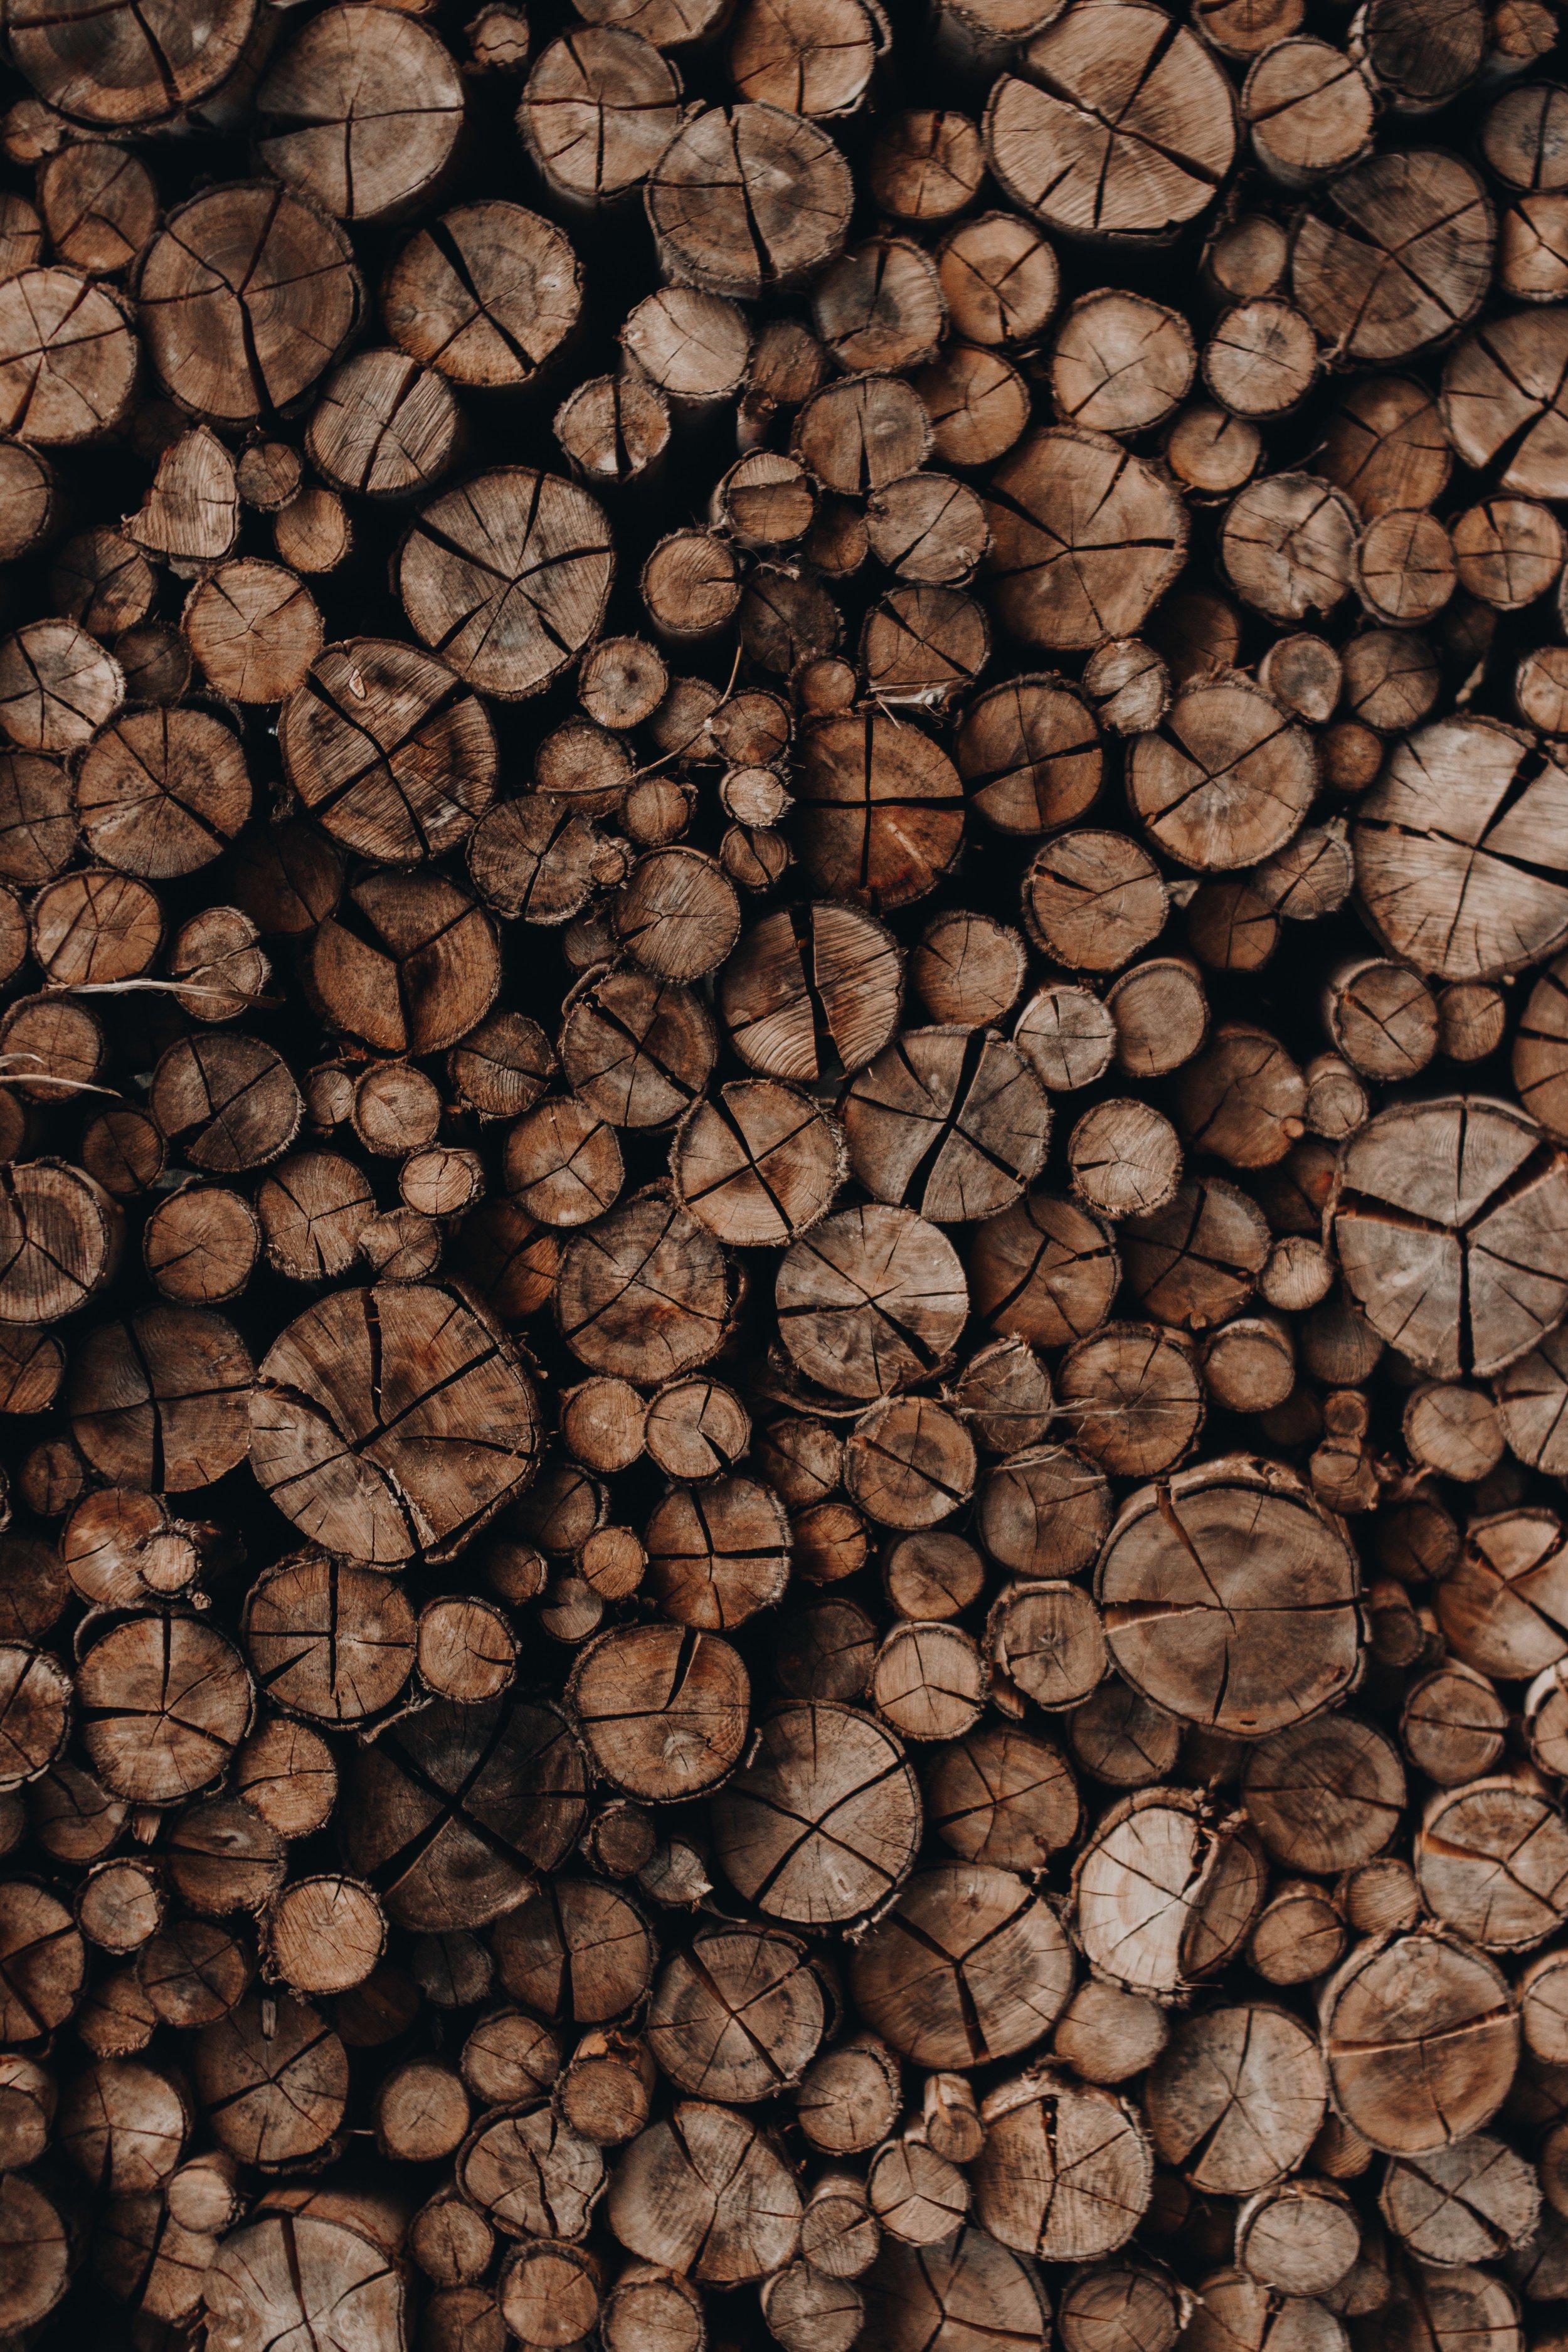 woodpexel.com